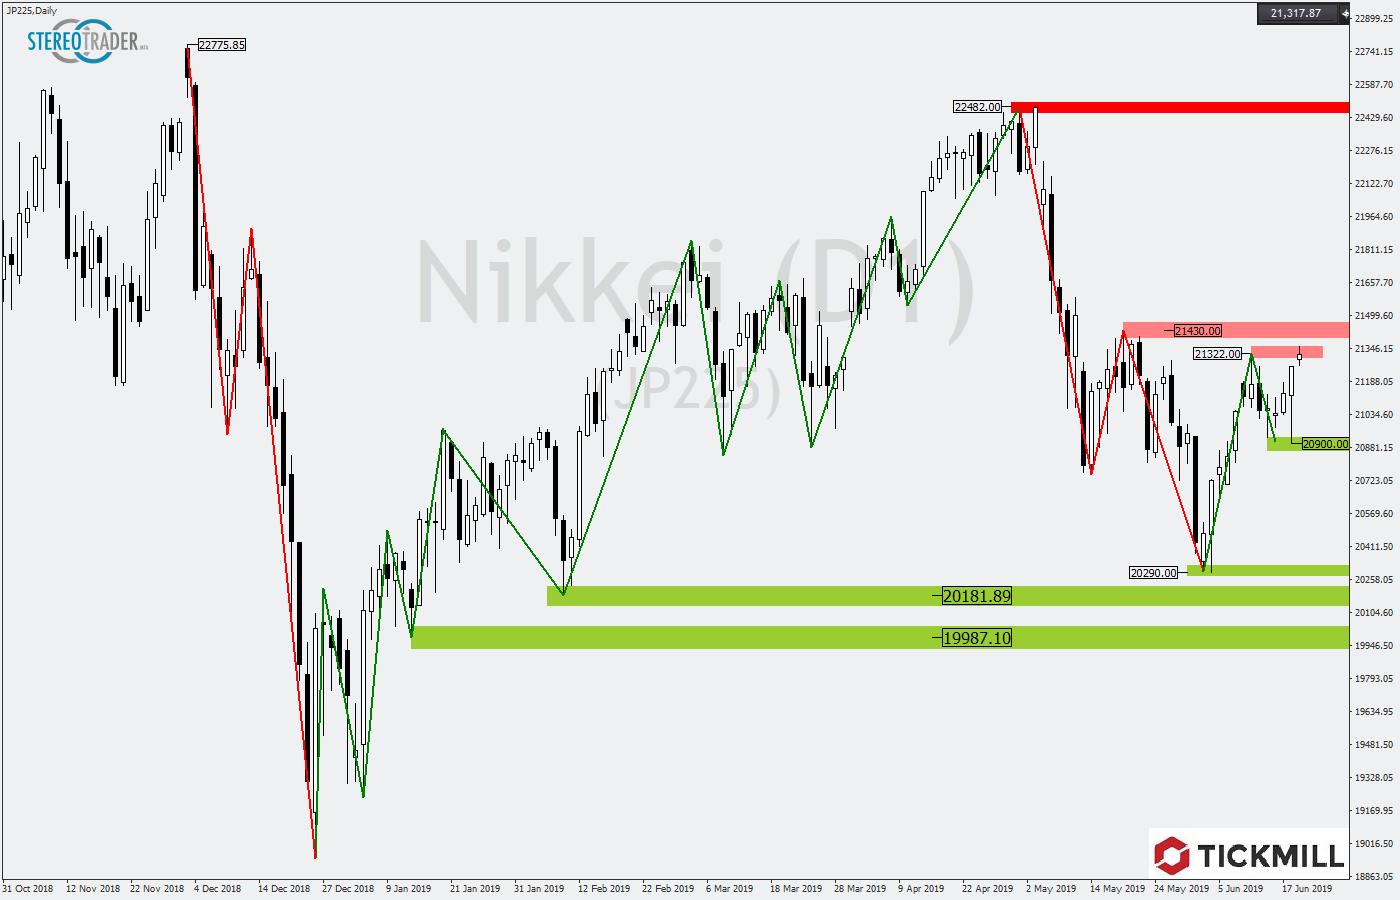 Tickmill-Analyse: Nikkei mit Überraschungspotential